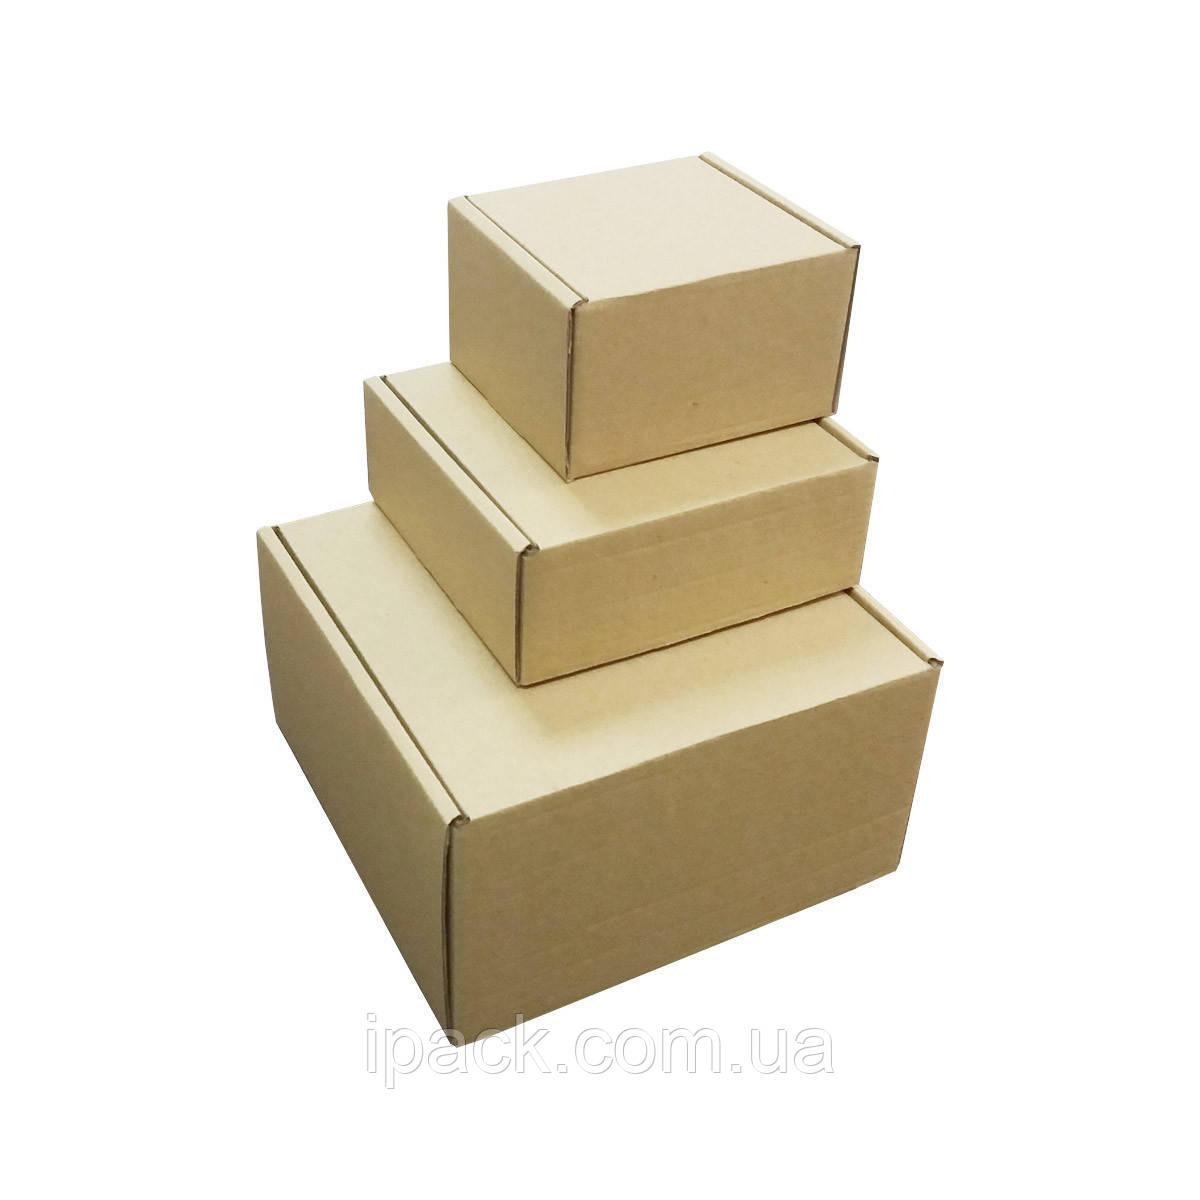 Коробка картонная самосборная, 300*250*120, мм, бурая, крафт, микрогофрокартон